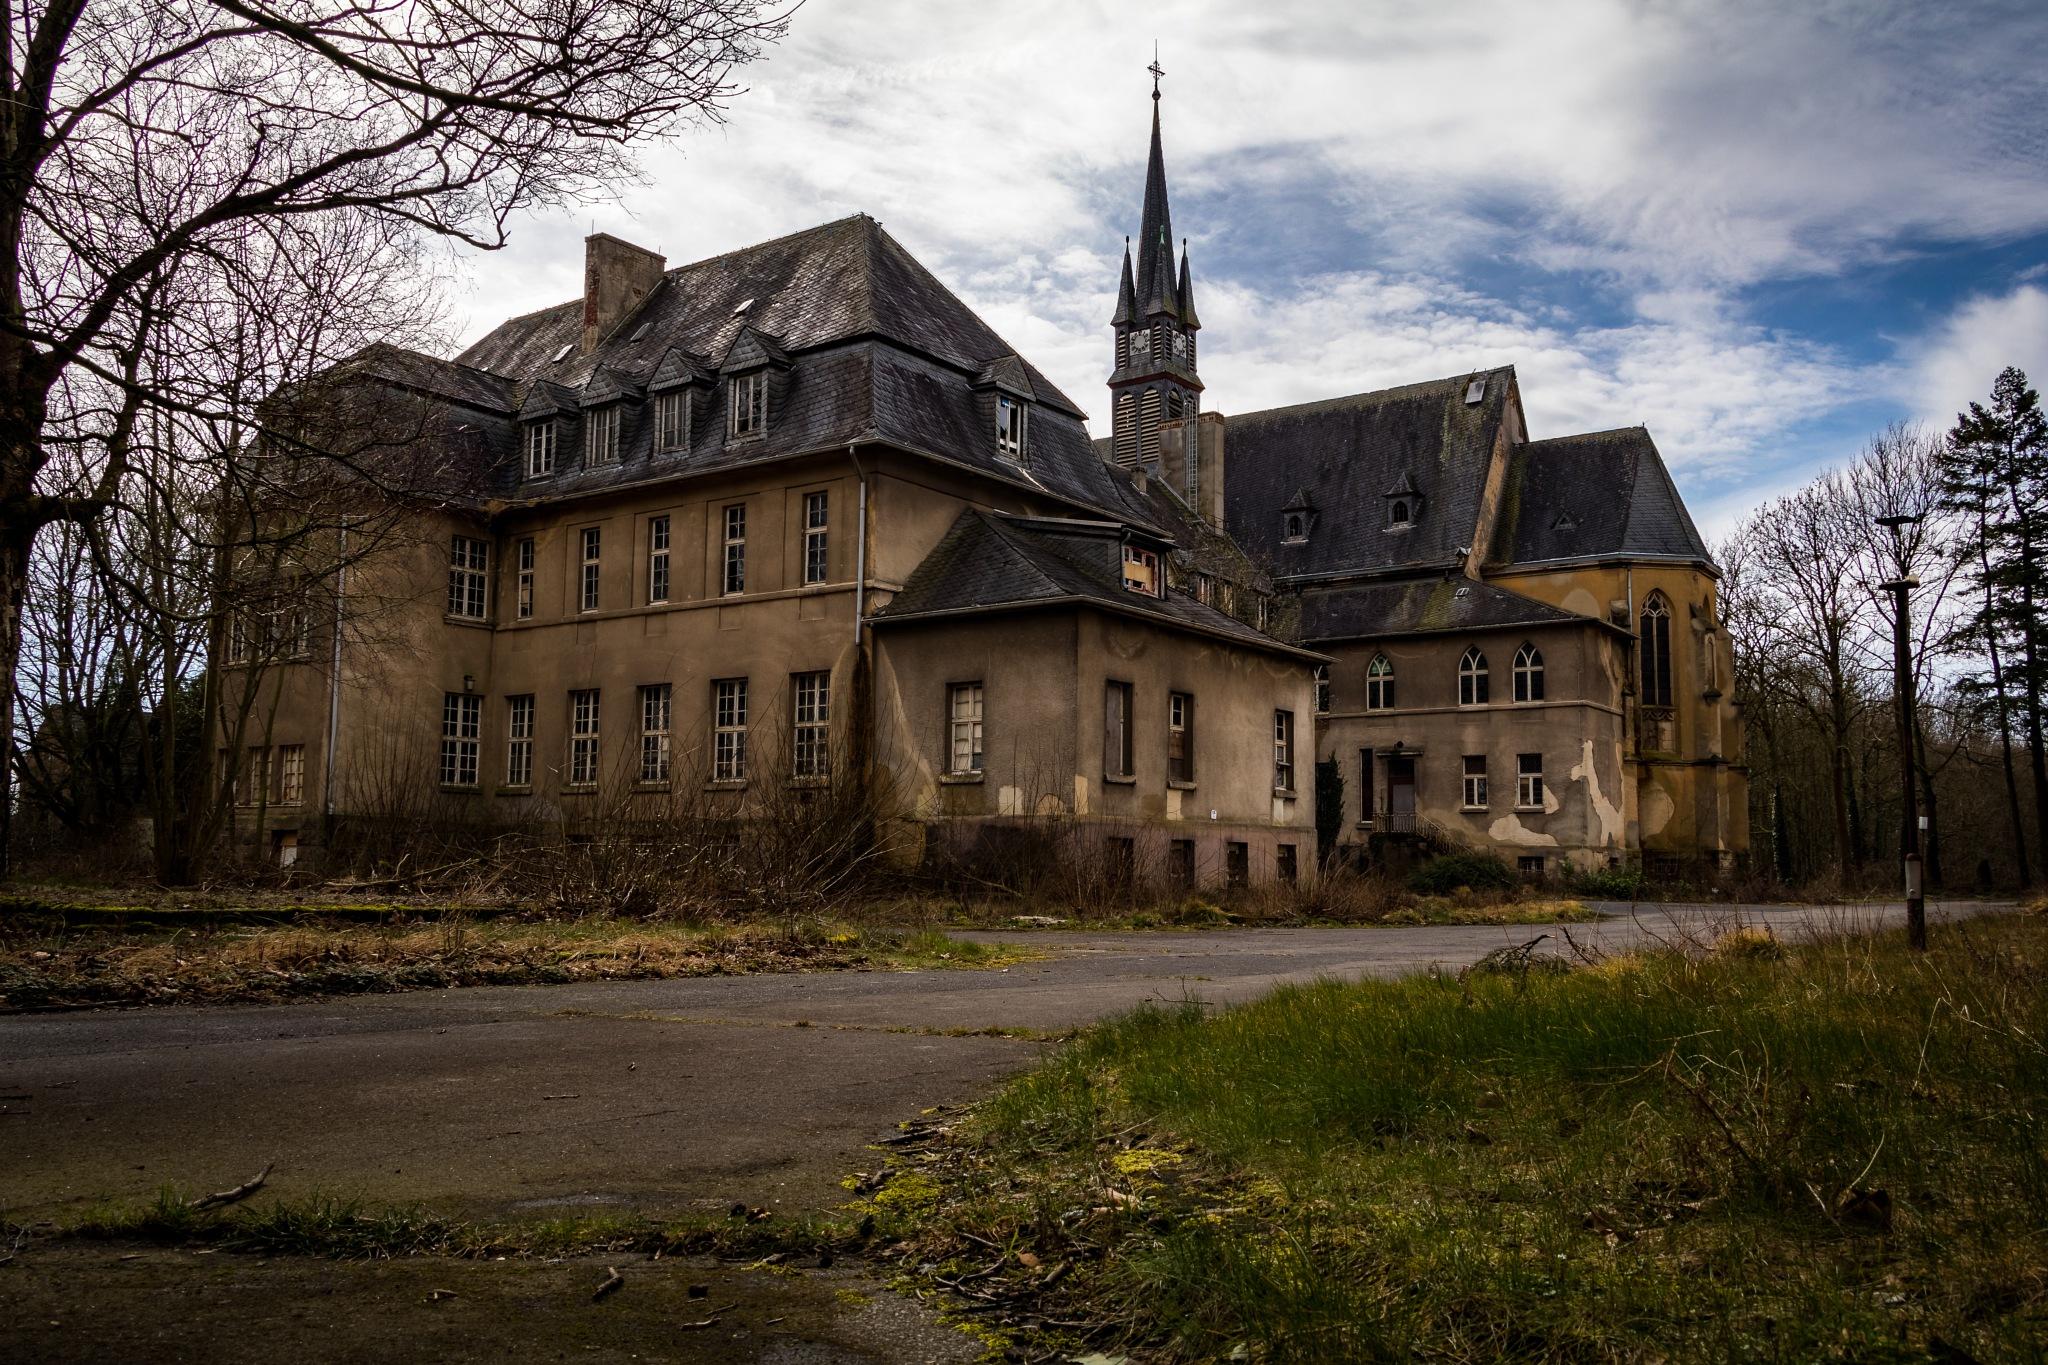 Kent School by Sven Kuhn